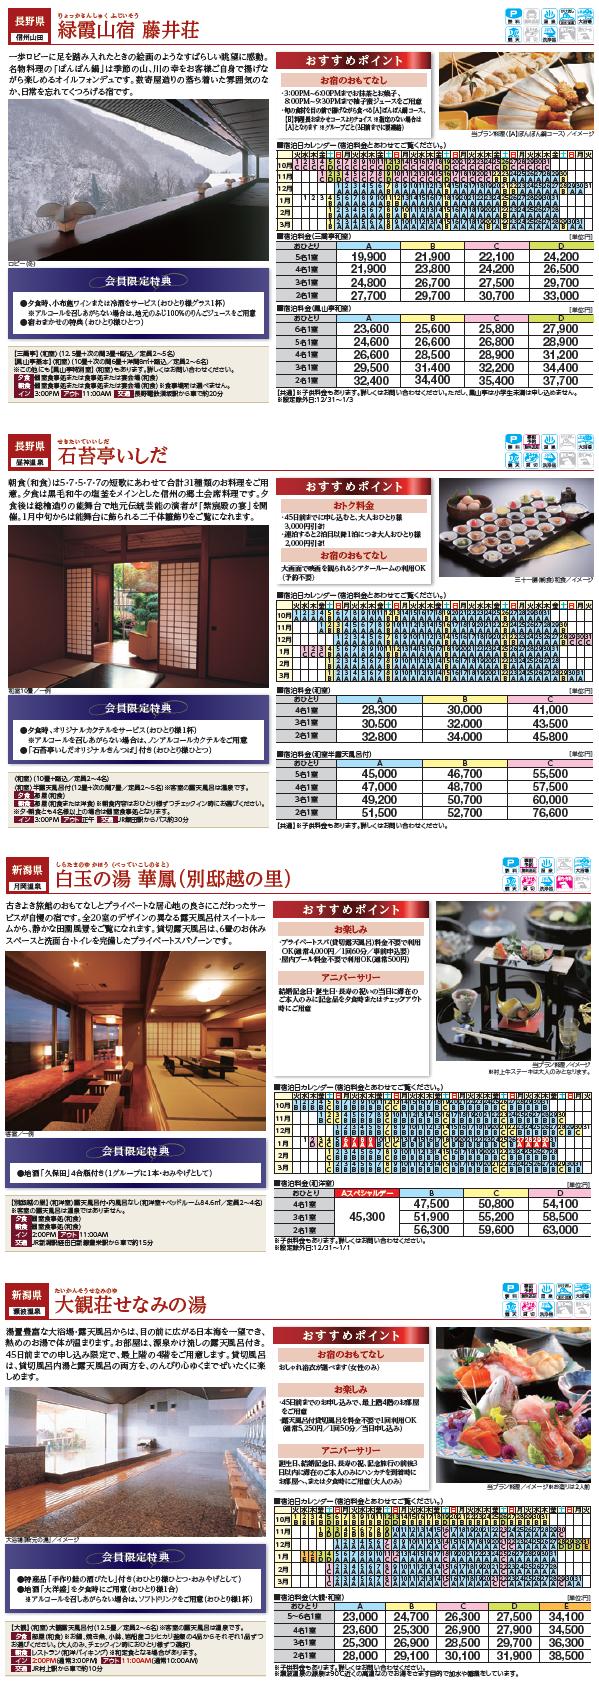 ryokan_plan1310_13